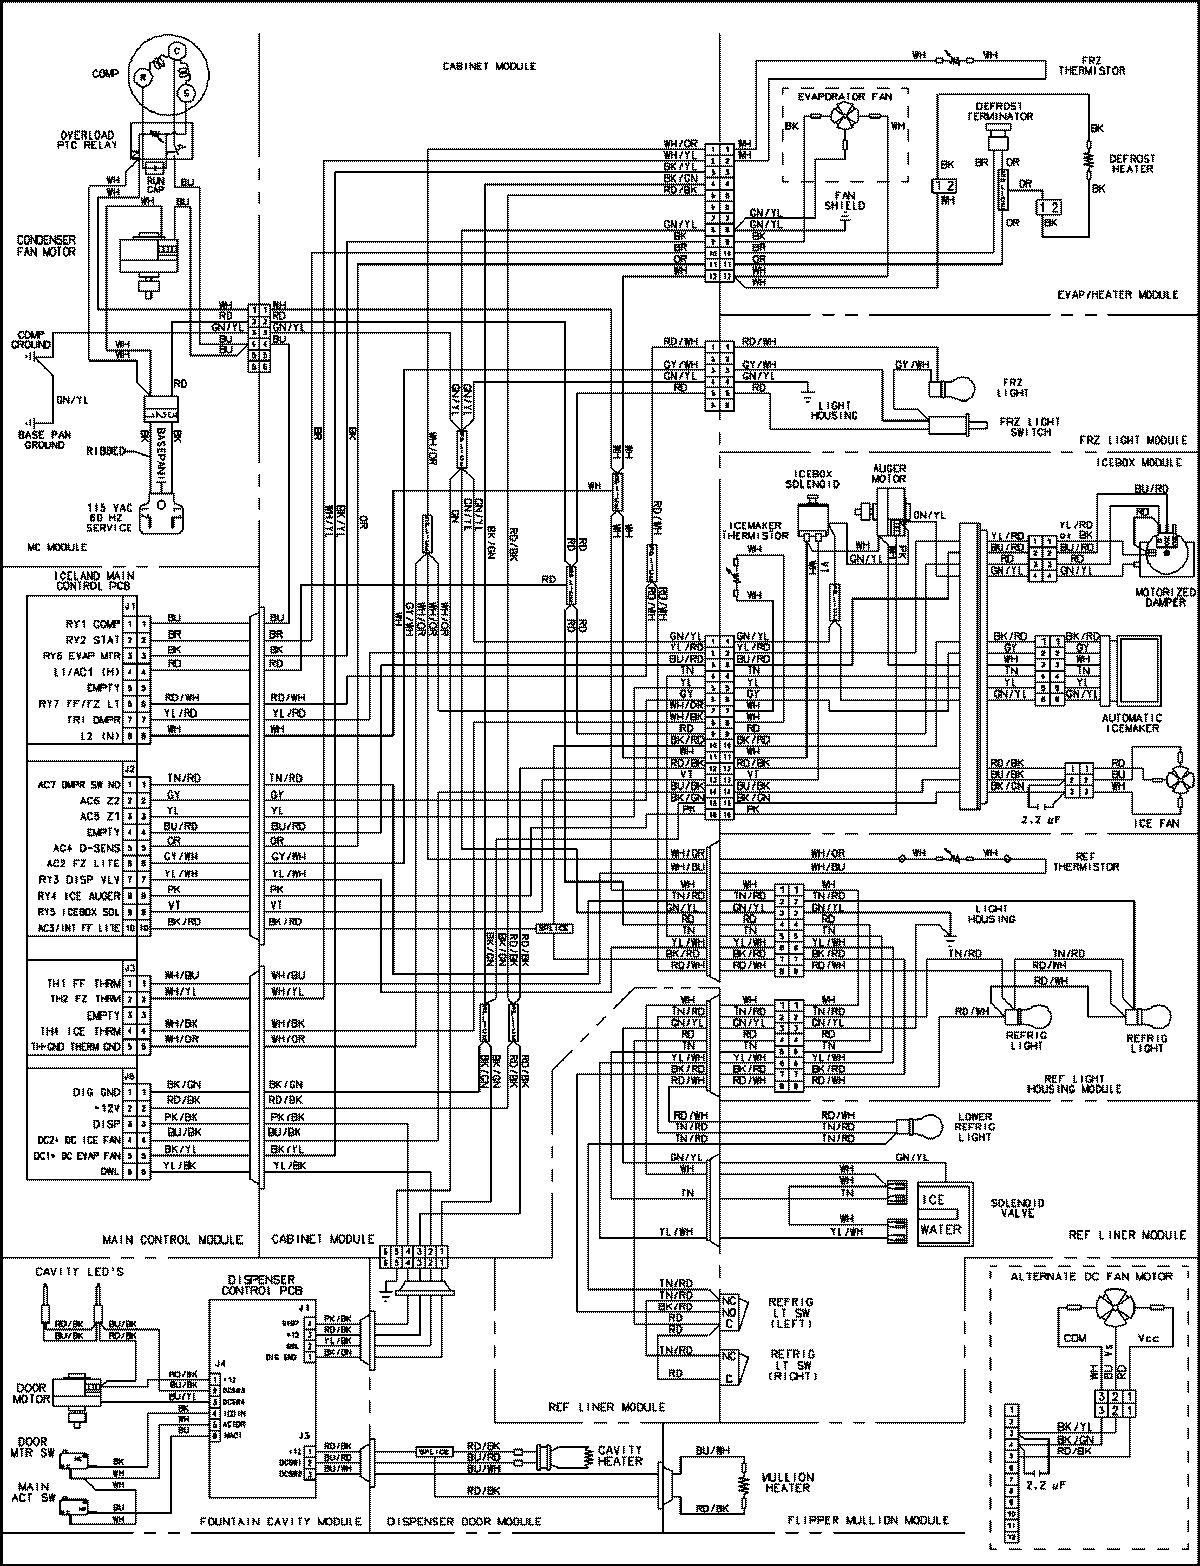 maytag dryer electrical schematic